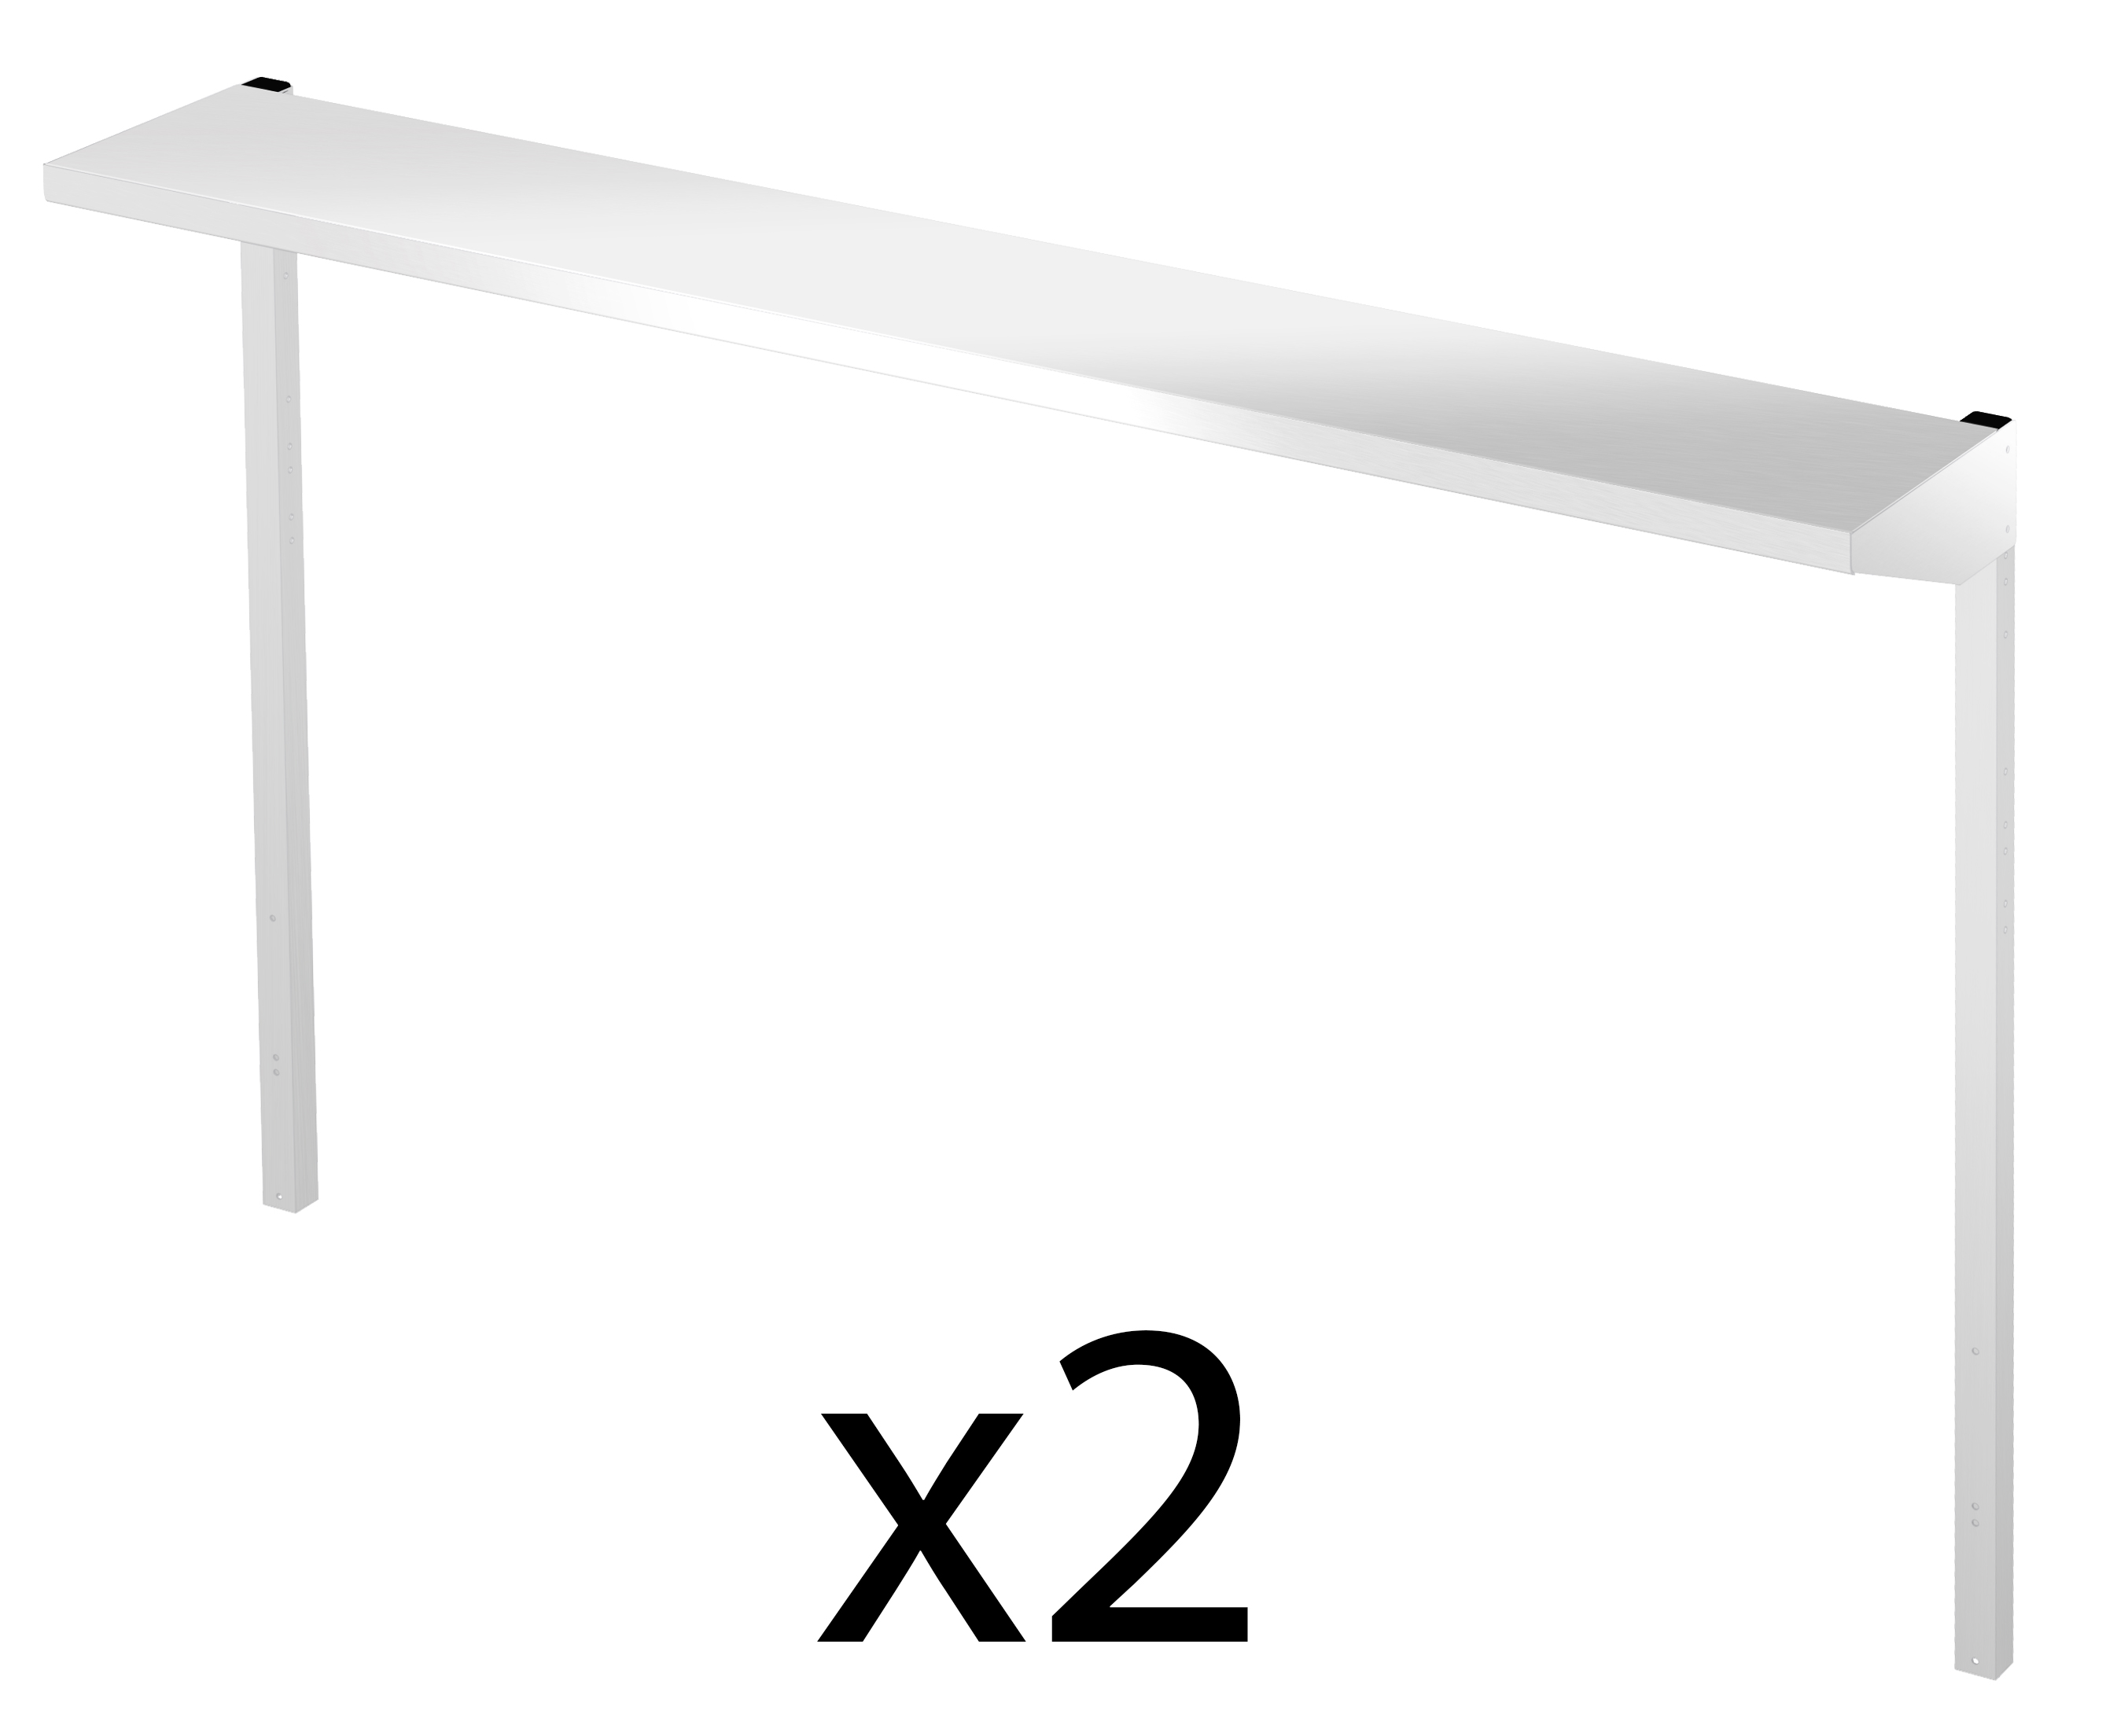 Hoshizaki HS-5229 (x2) shelving/shelving systems